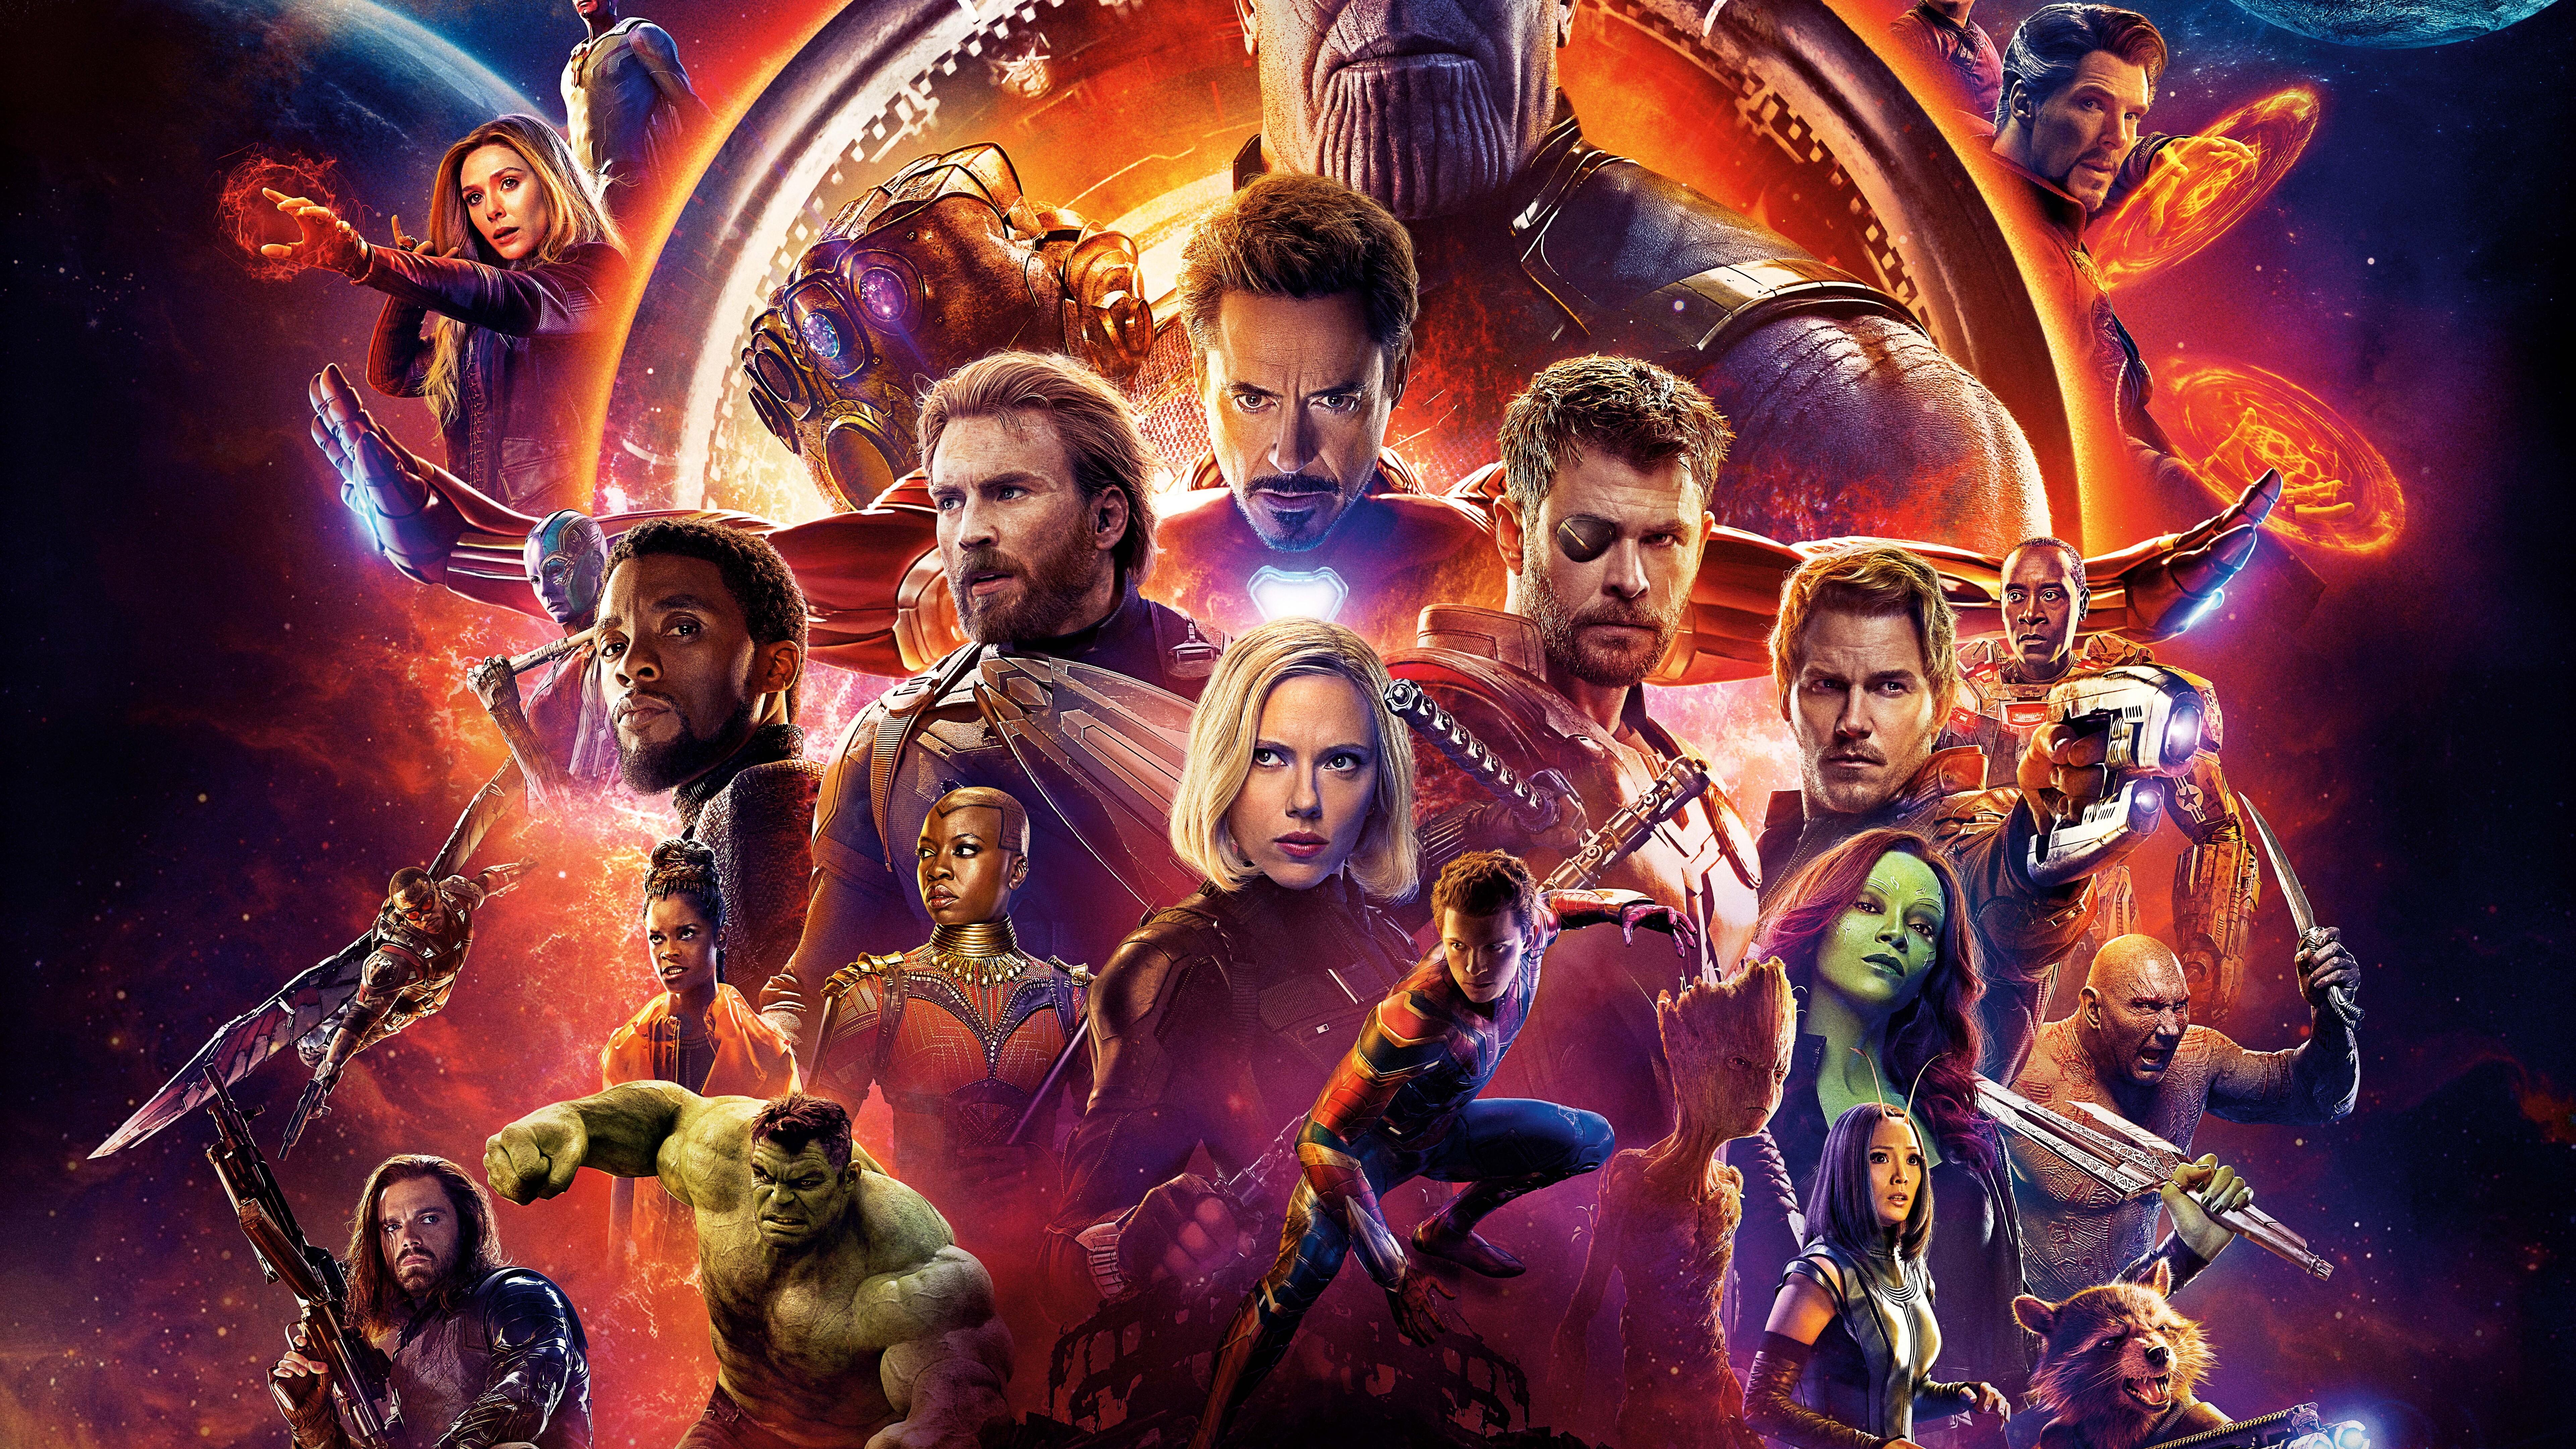 7680x4320 avengers infinity war 2018 10k poster 8k hd 4k wallpapers